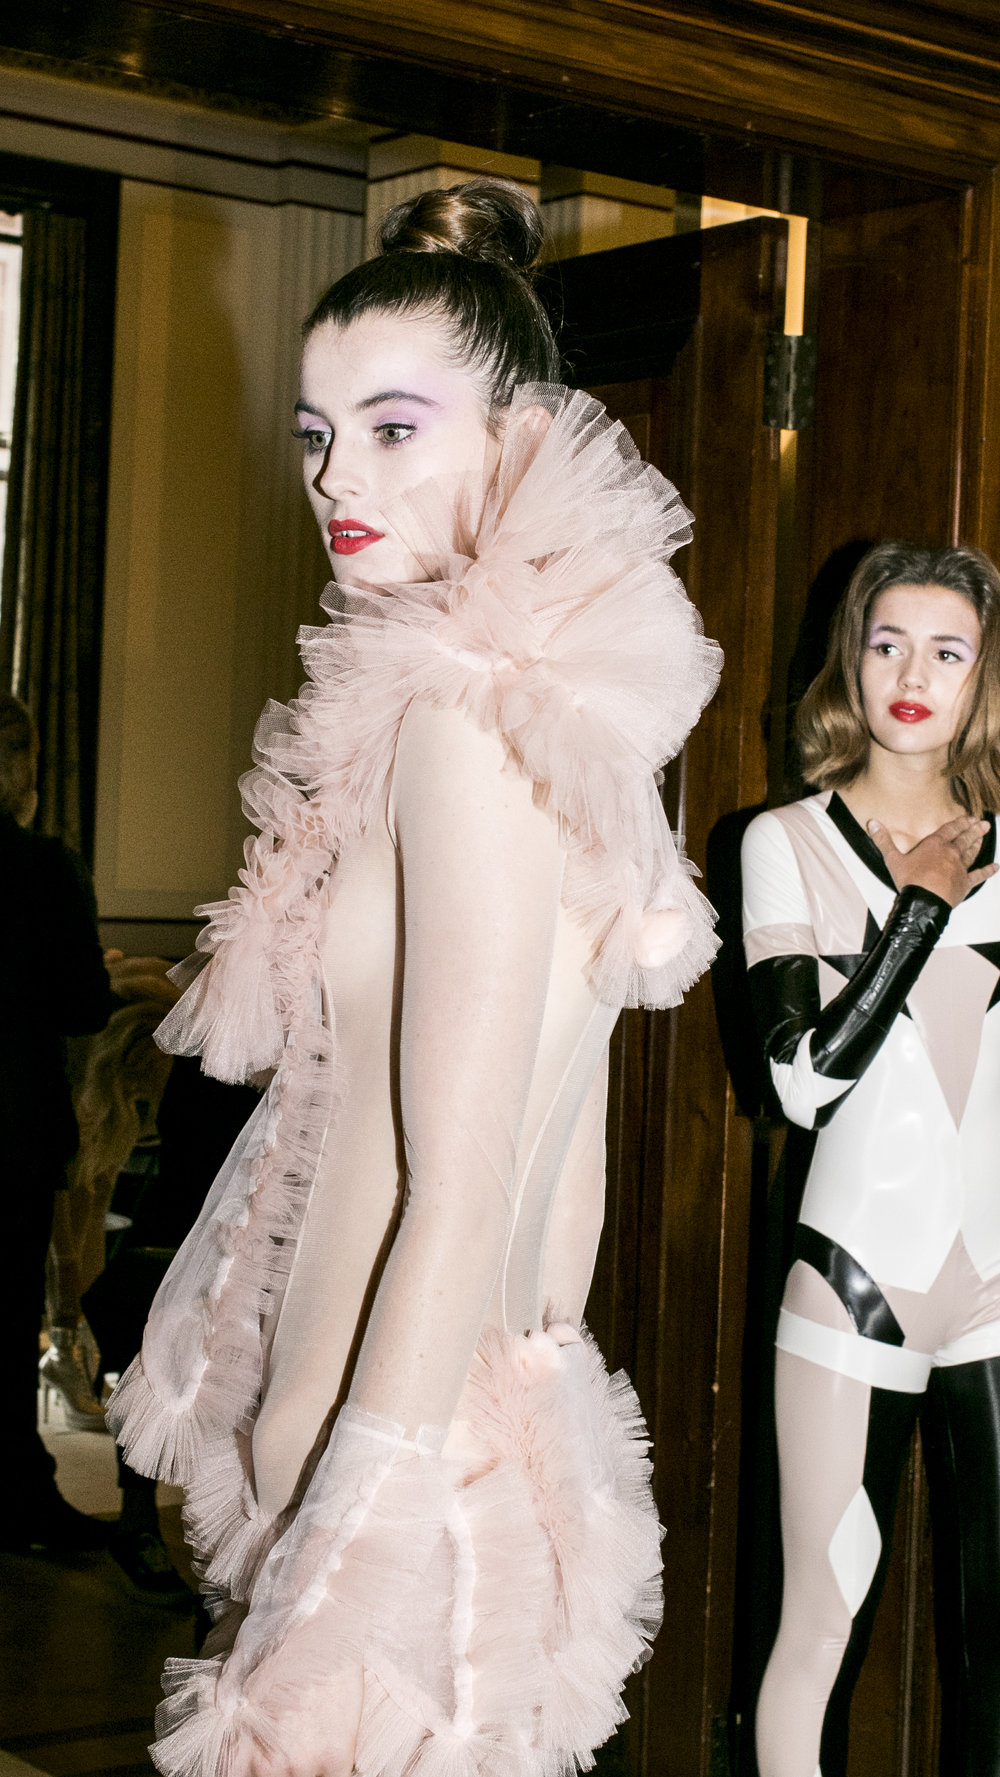 London Fashion Week Pam Hogg SS18 catwalk show